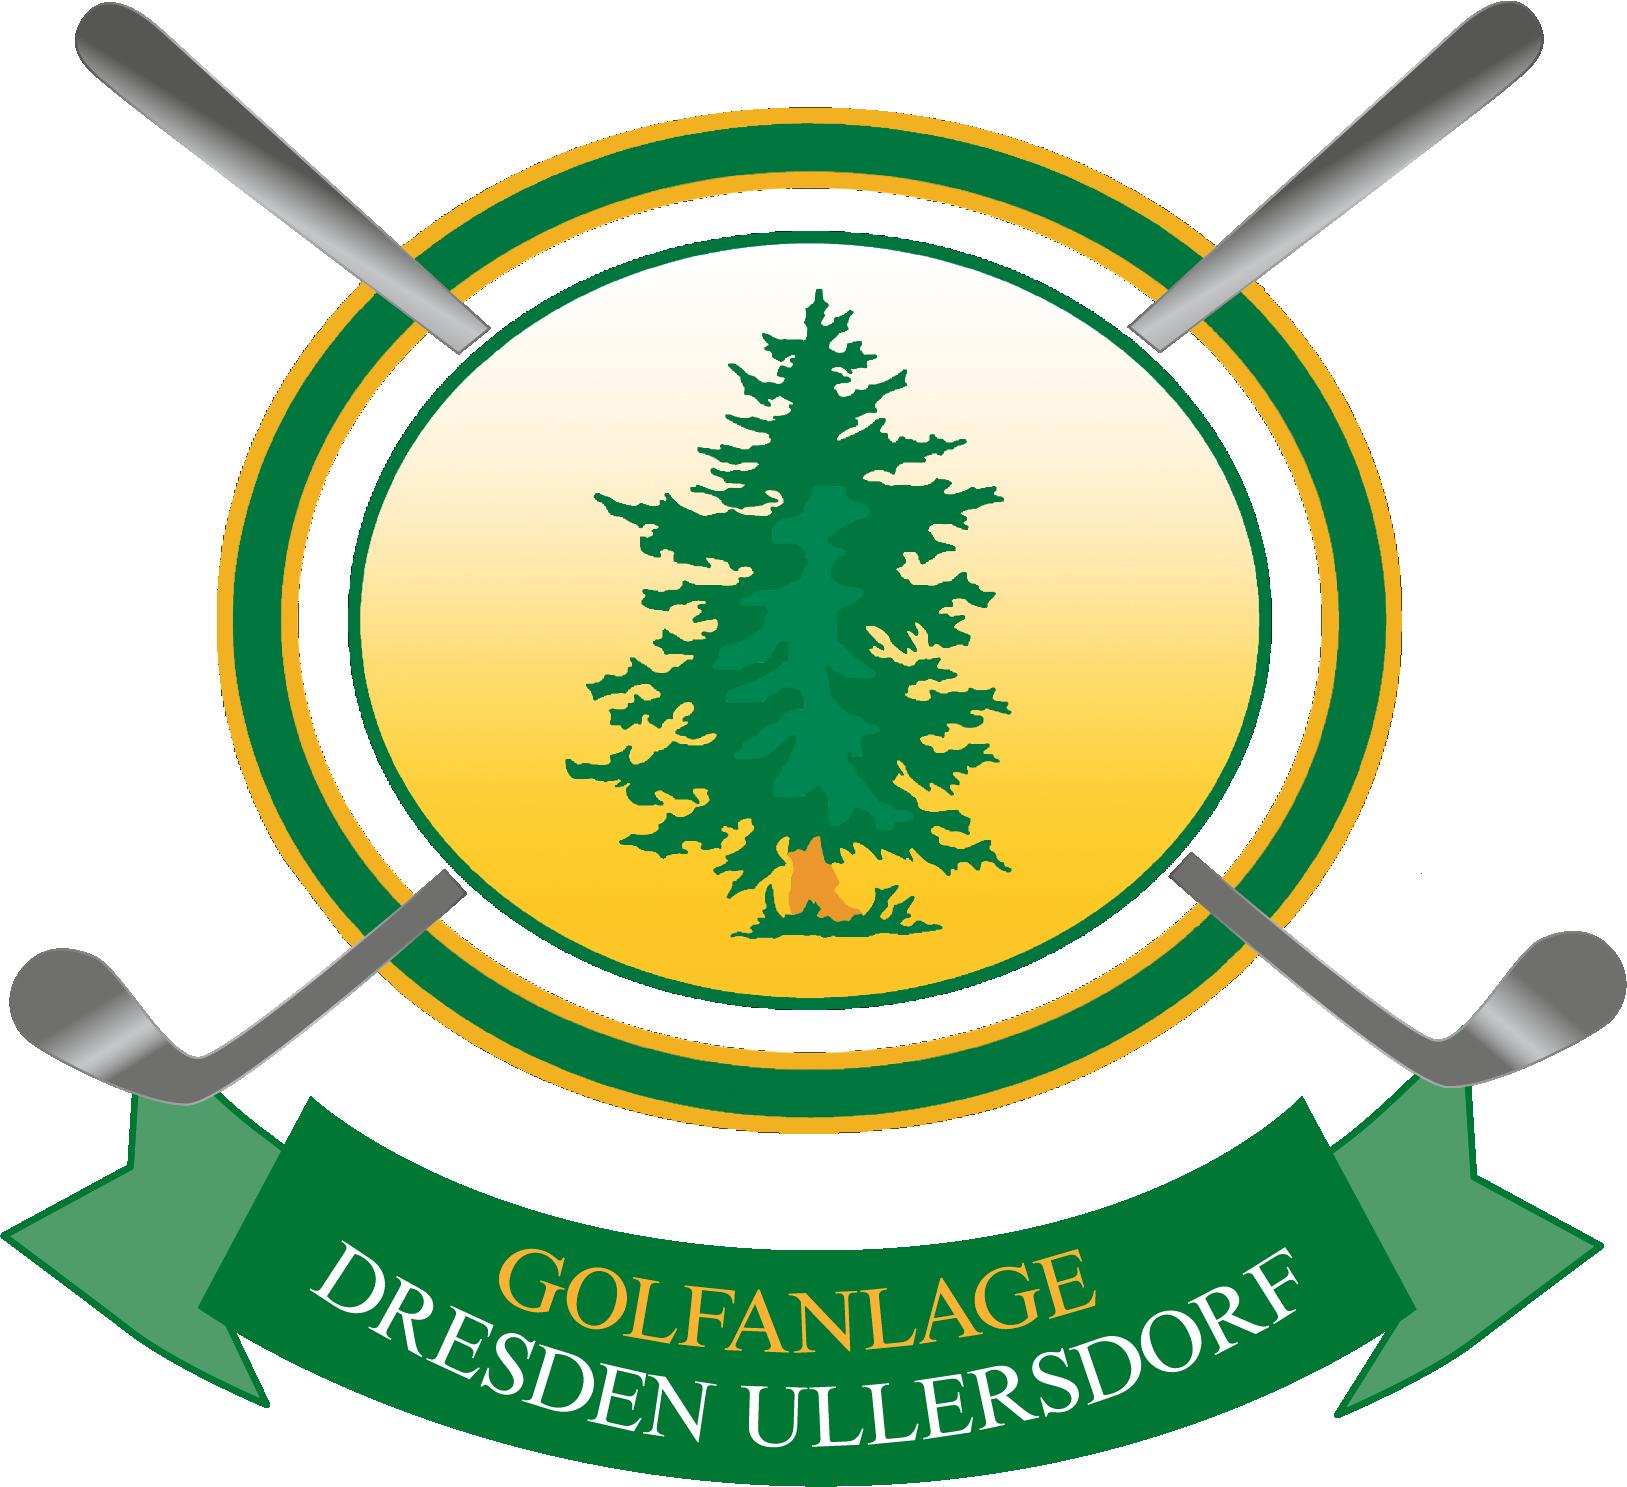 Ullersdorfer Golfanlage